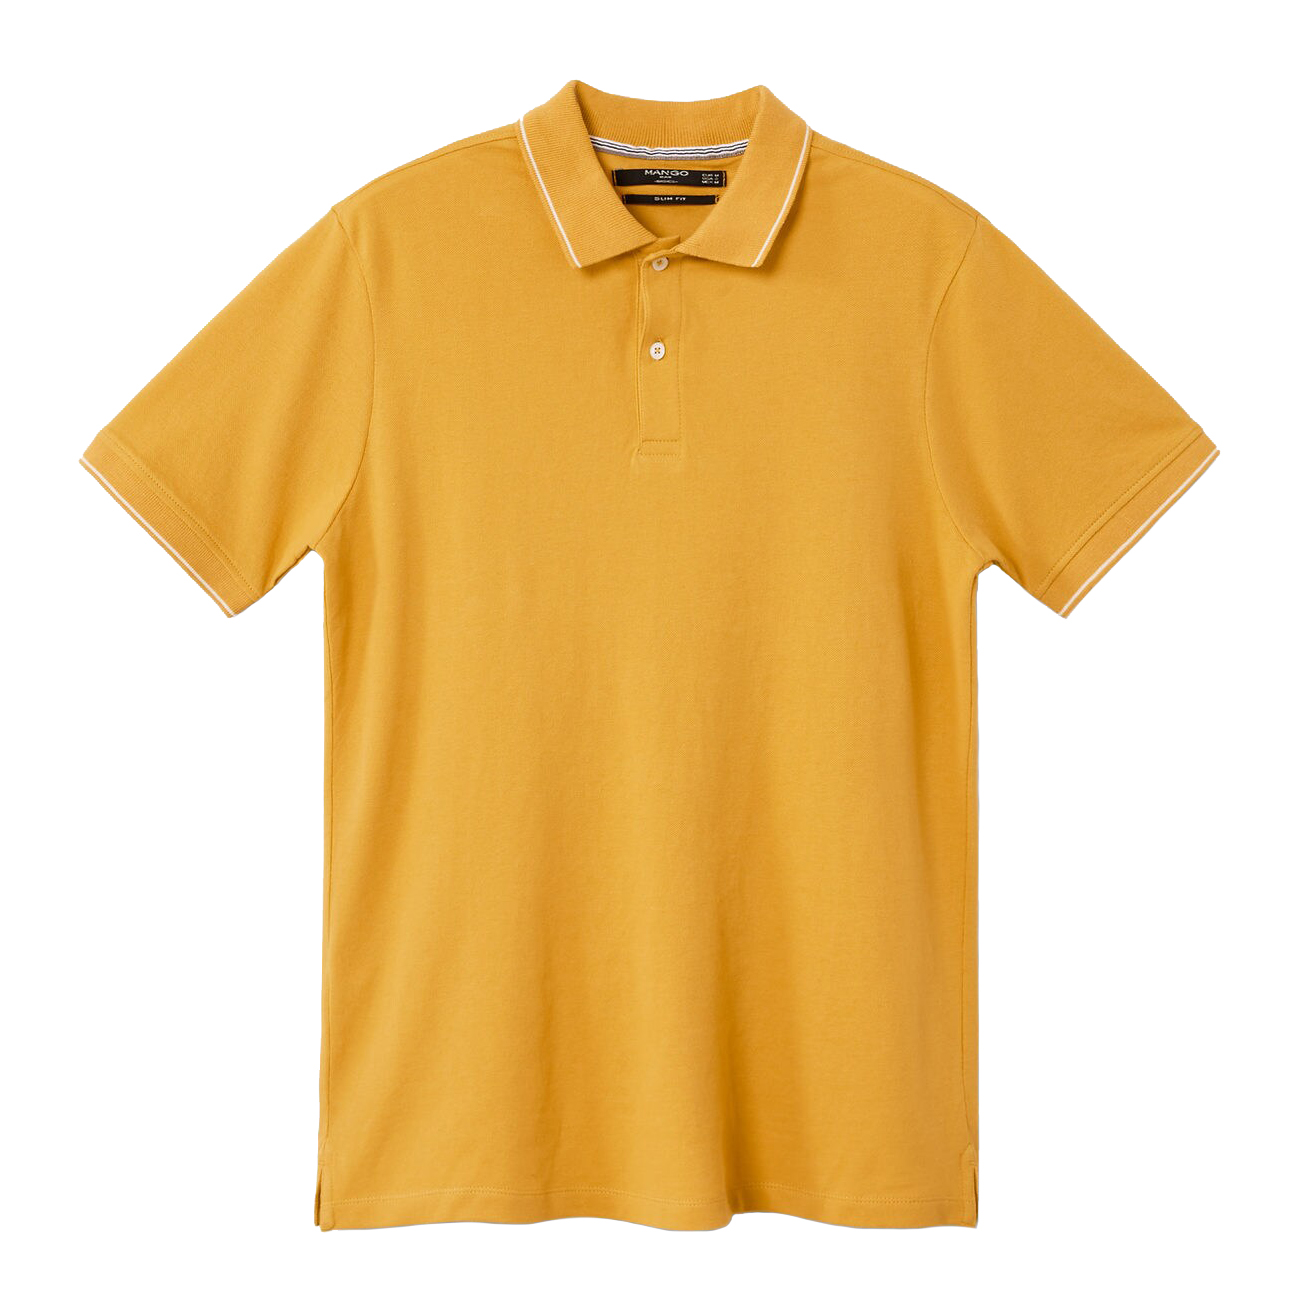 پولوشرت آستین کوتاه مردانه مانگو مدل Y720